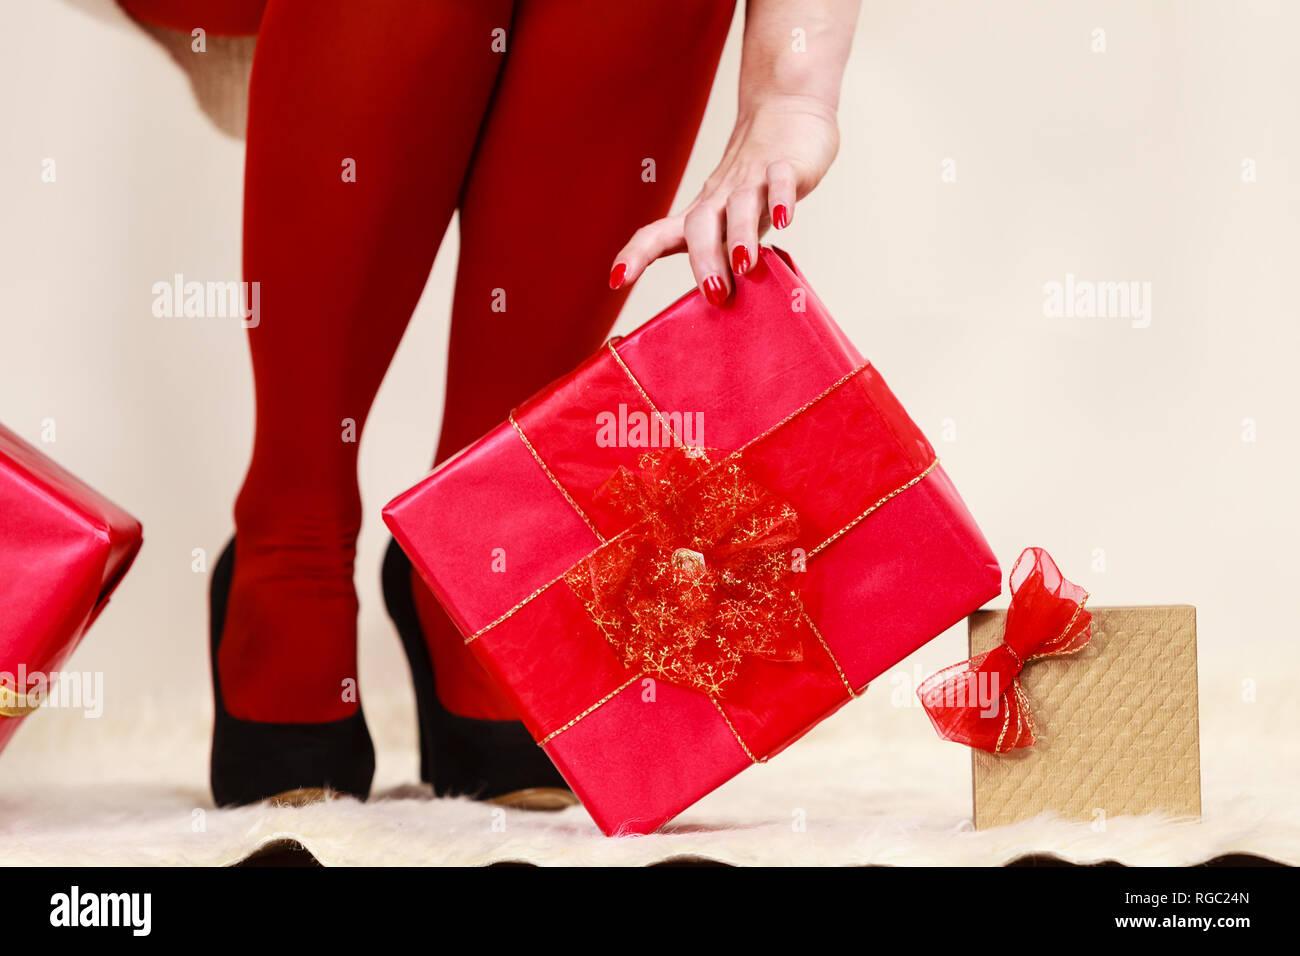 2dfb6baee1 Intenso Largas Negro Moda Mujer Pantyhose Piernas Color Rojo En wEAXnAqWz